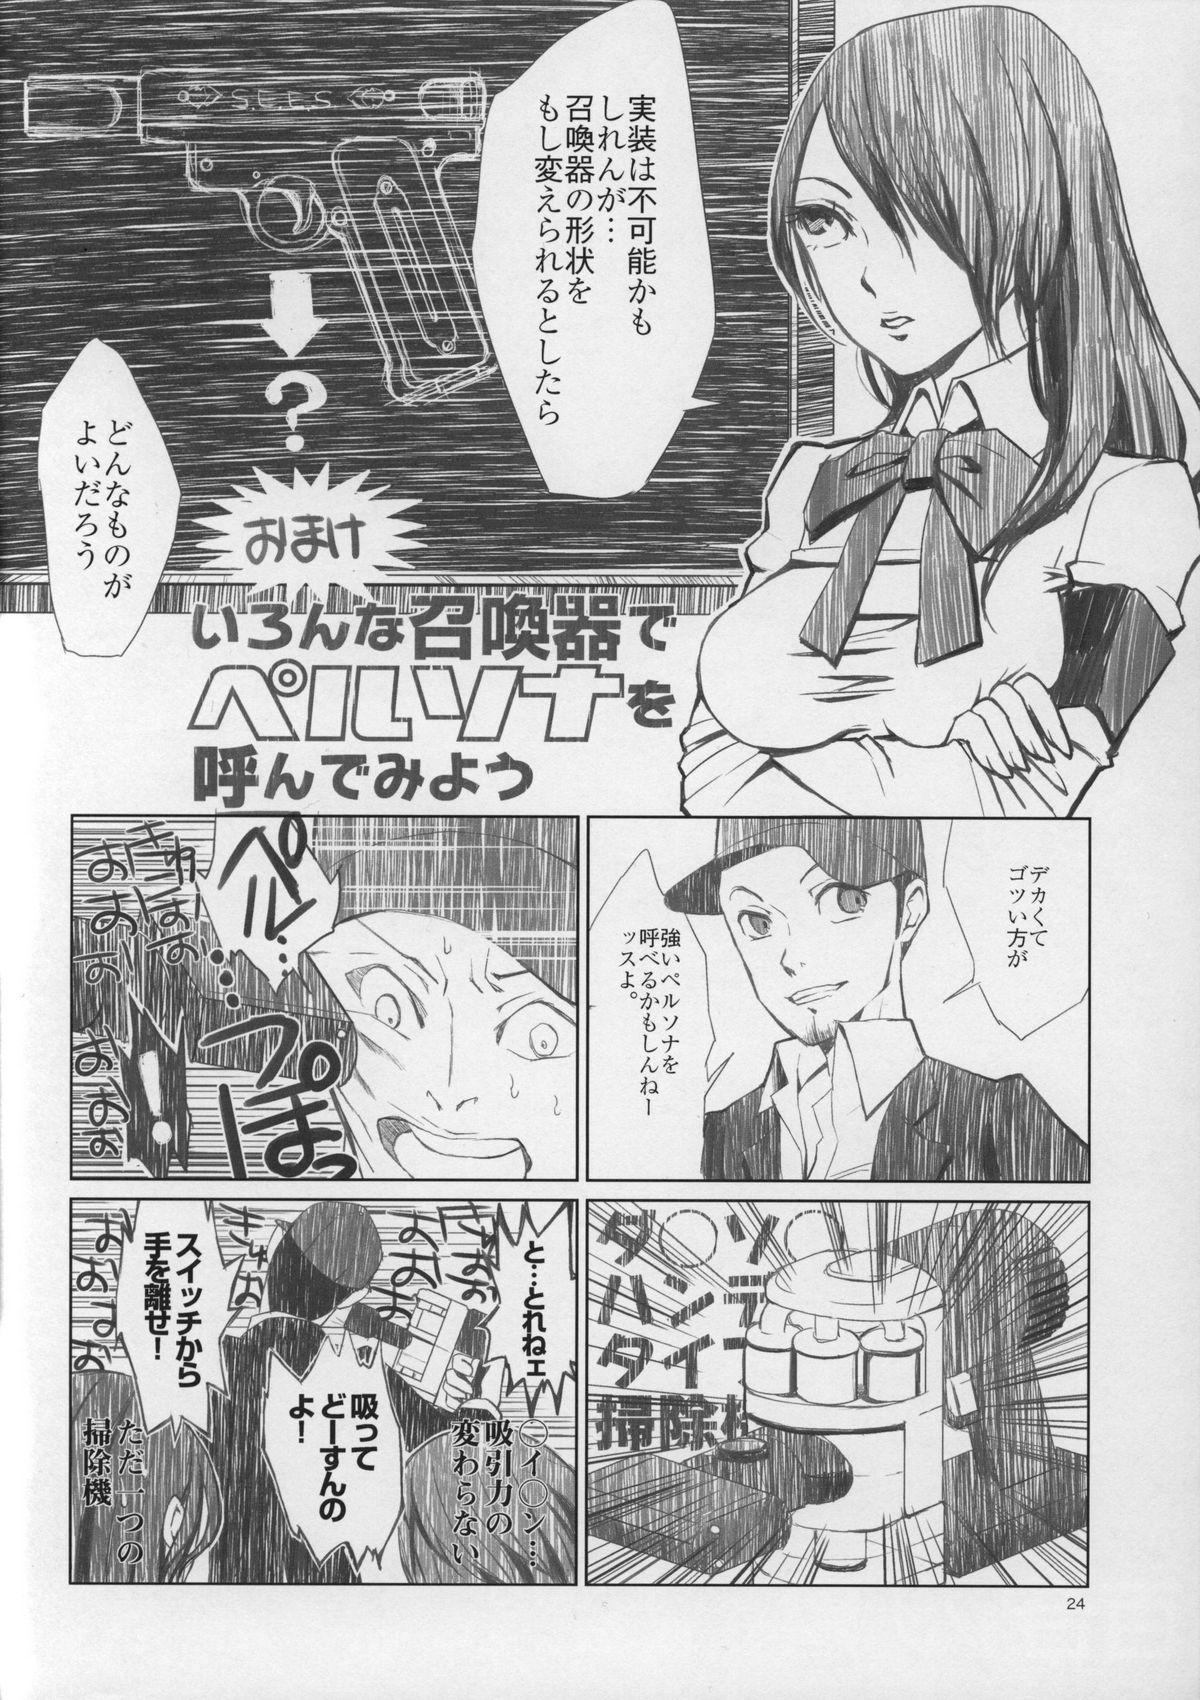 YURI SONA 2 Yoru no Joou - Midnight Queen 22